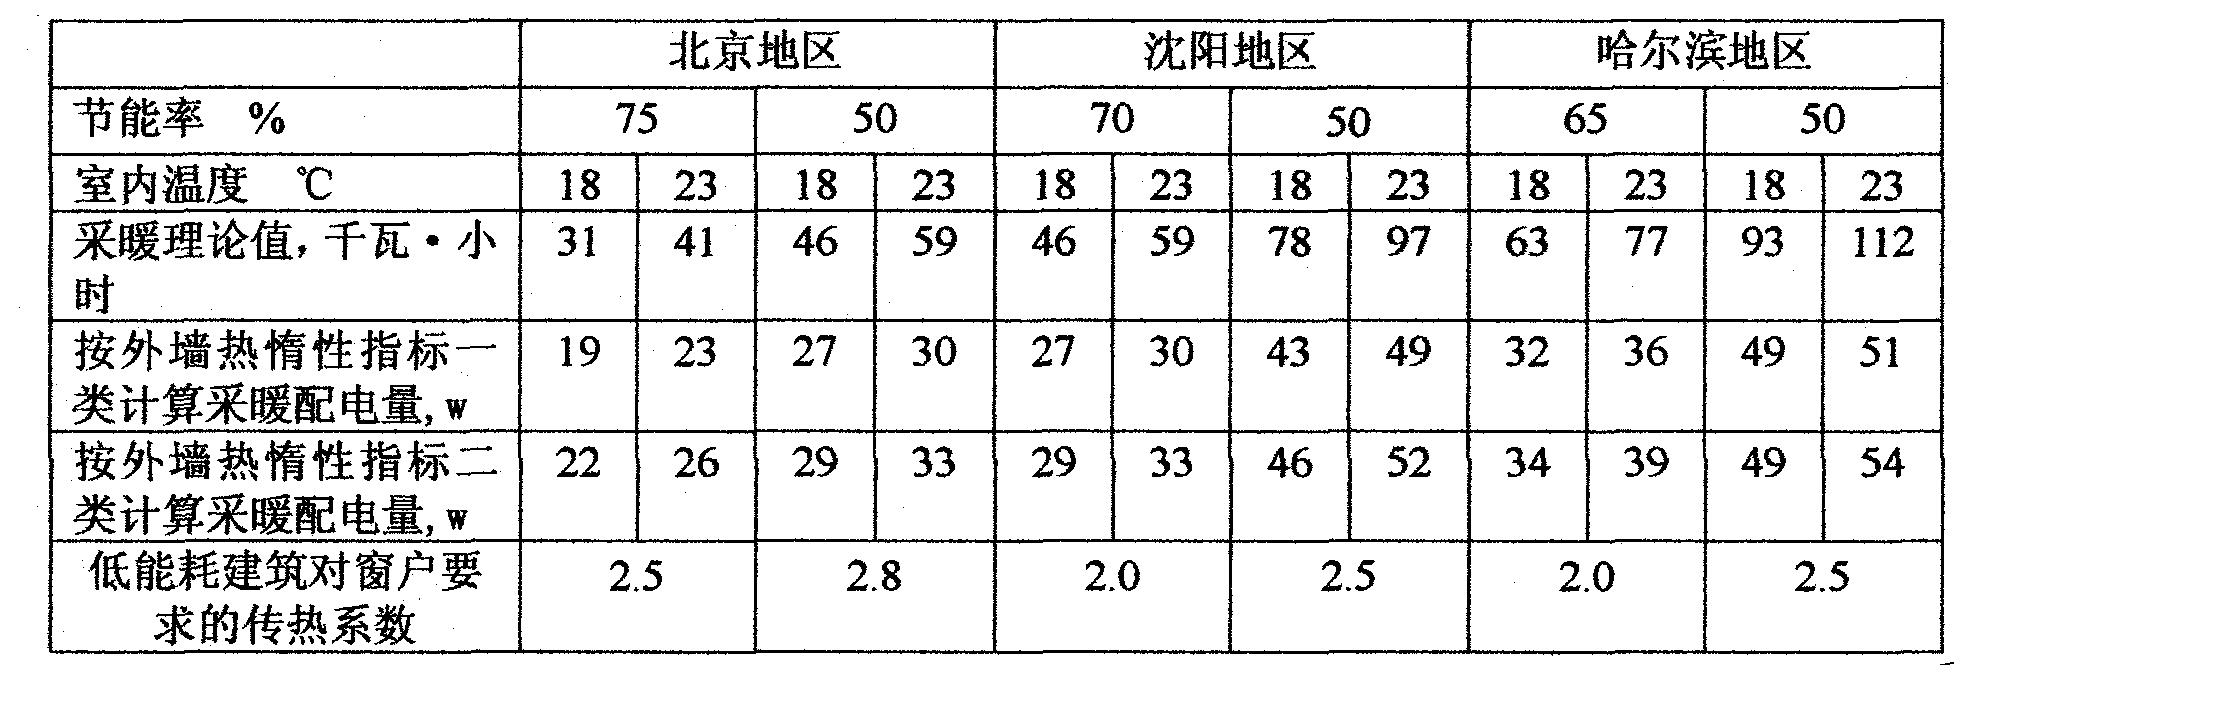 Figure CN203174810UD00101